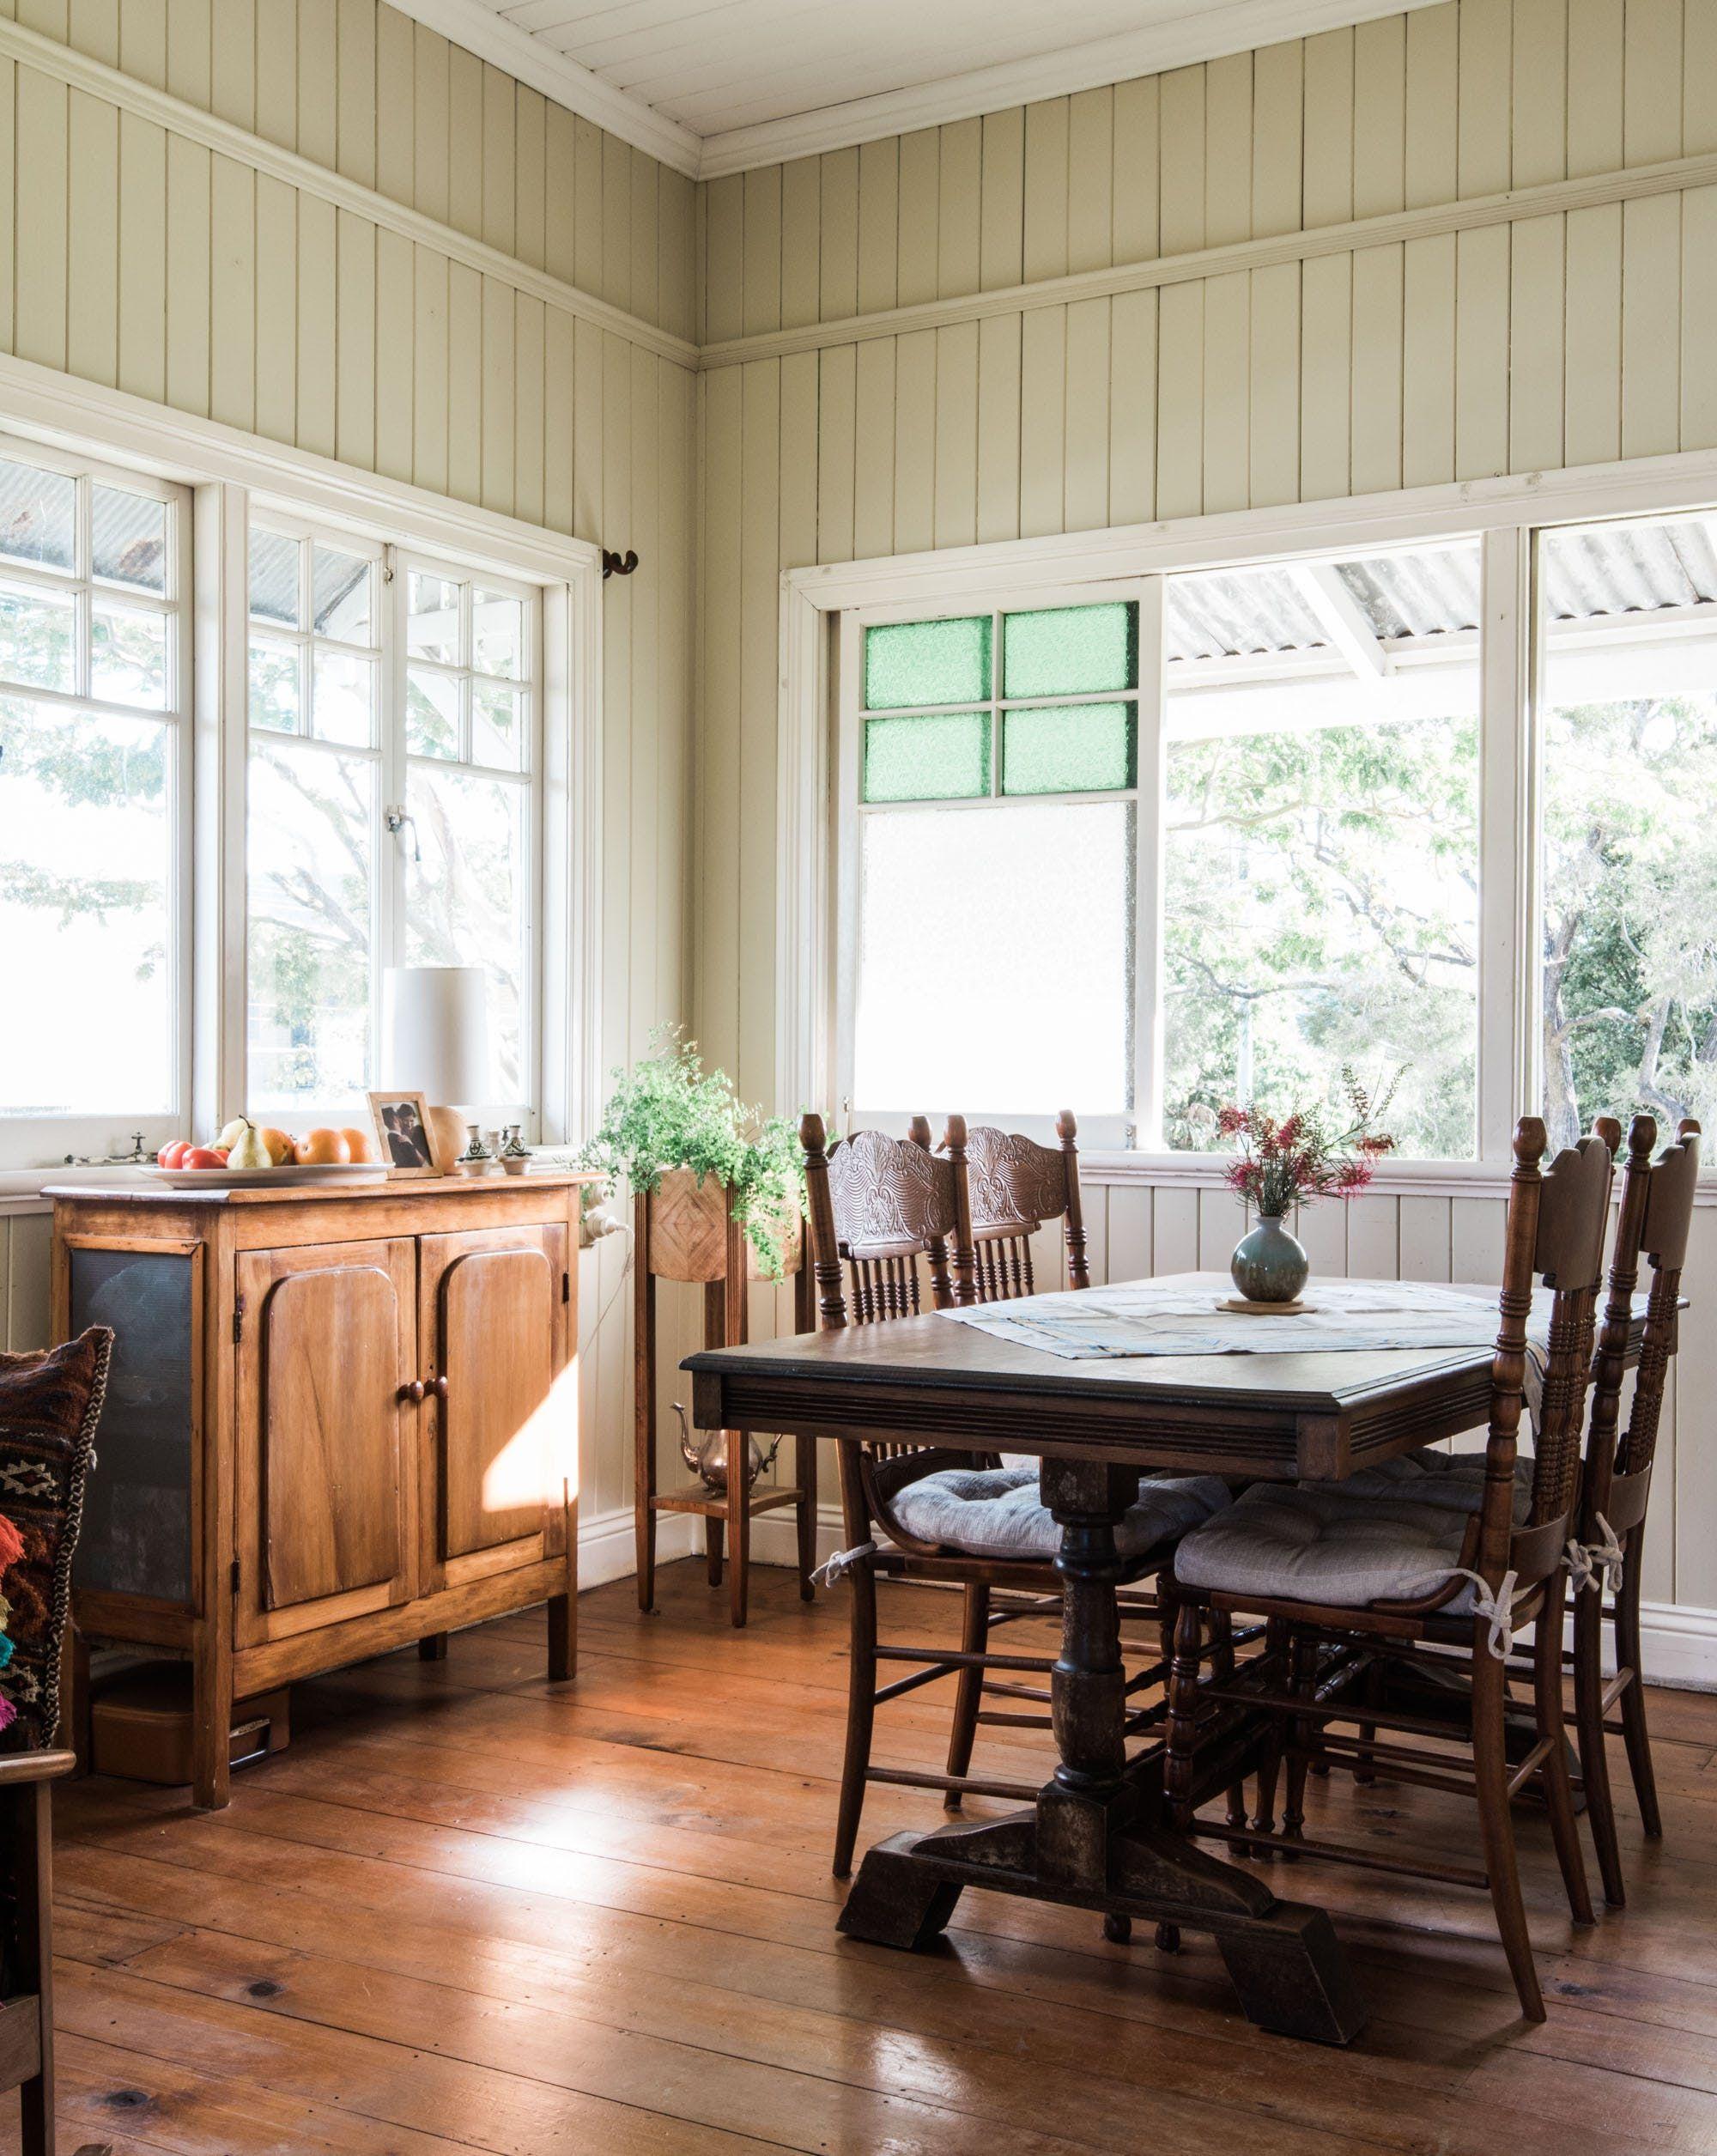 A Warm, Bohemian Country Style Australian Home ...